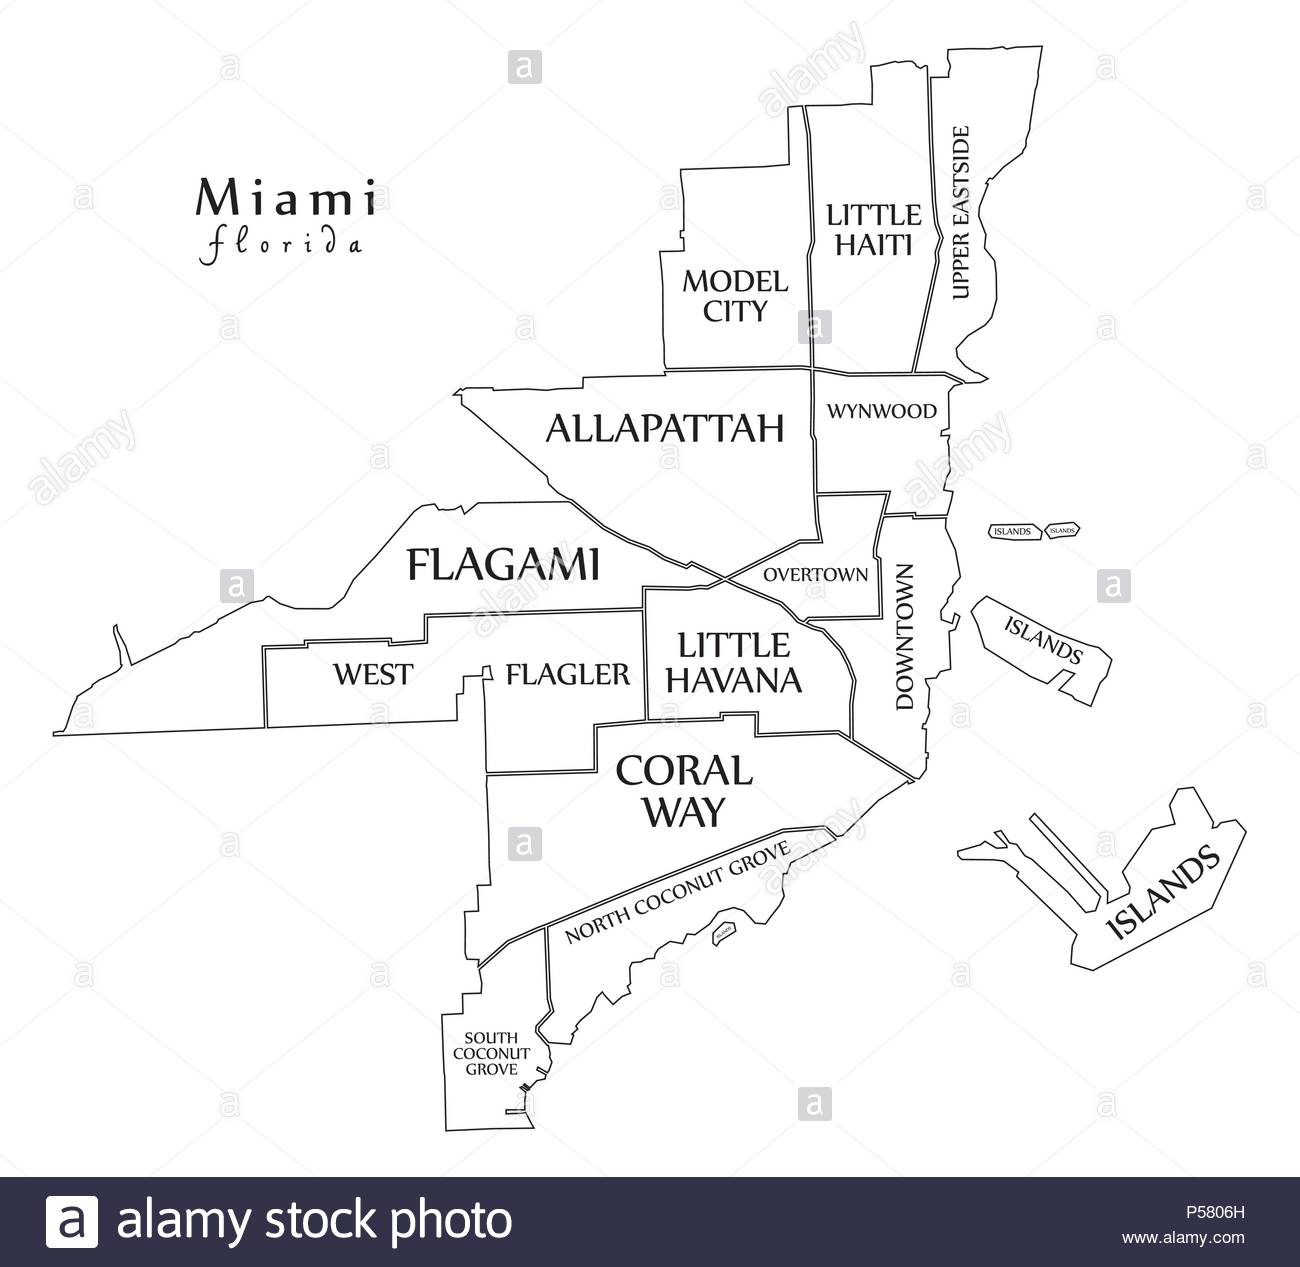 Modern City Map - Miami Florida City Of The Usa With Neighborhoods - Florida City Map Outline